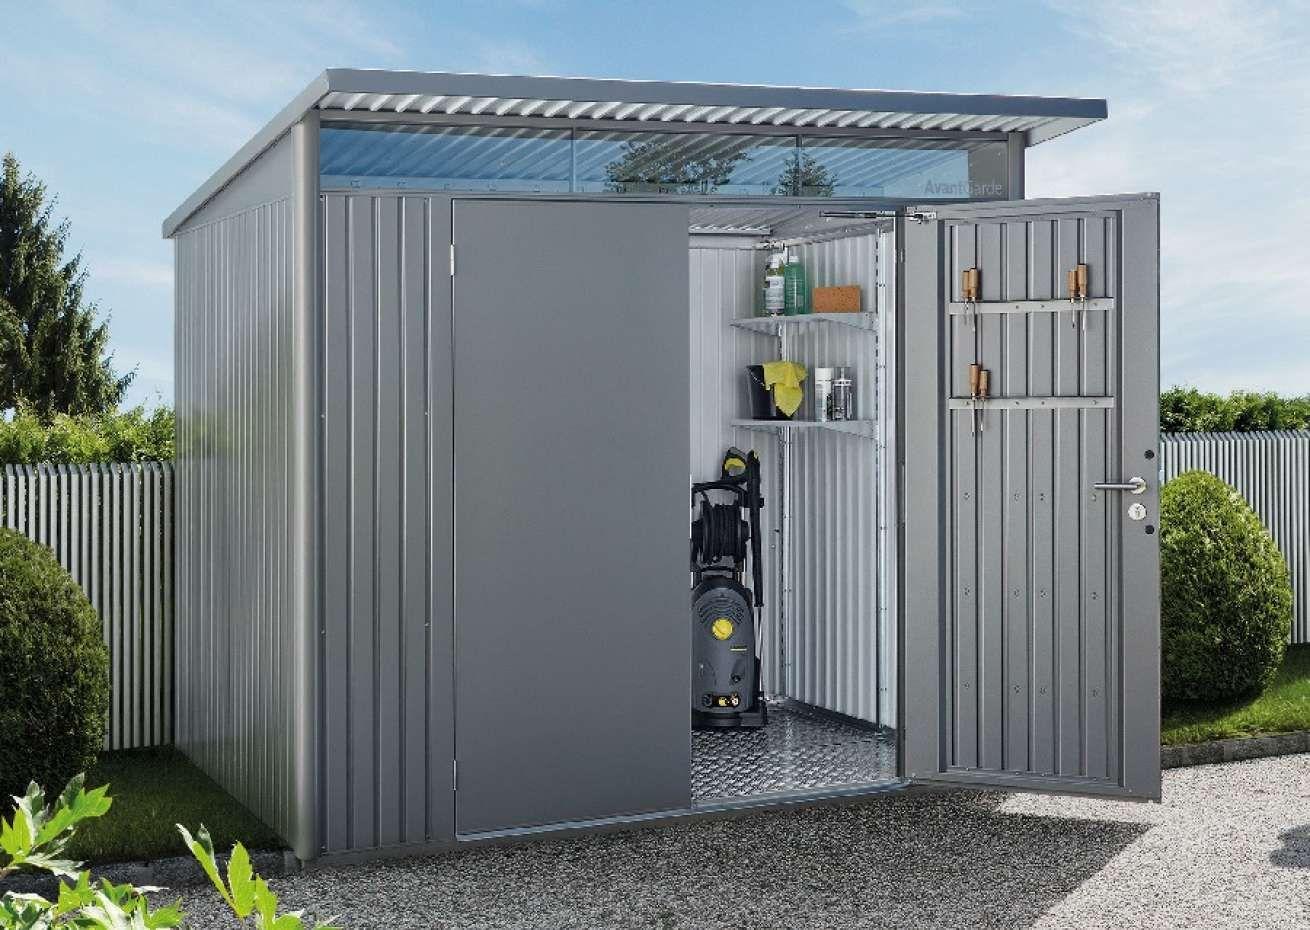 Biohort Geratehaus Avantgarde Gartenhaus Metall Gartenhaus Haus